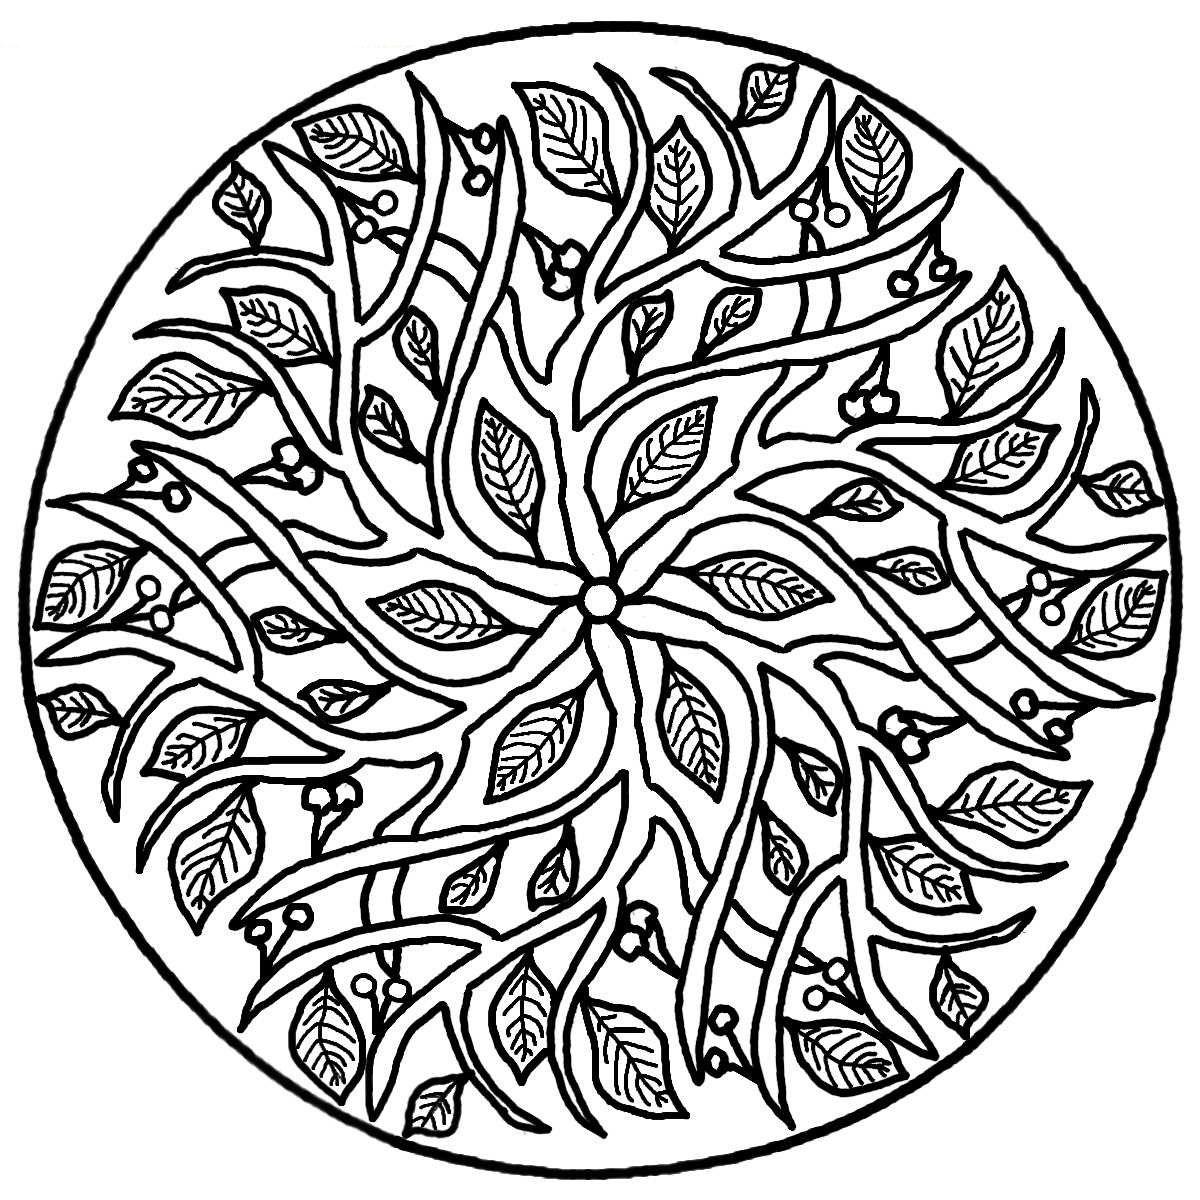 Online colouring in mandala - Realistic Mandala Coloring Page